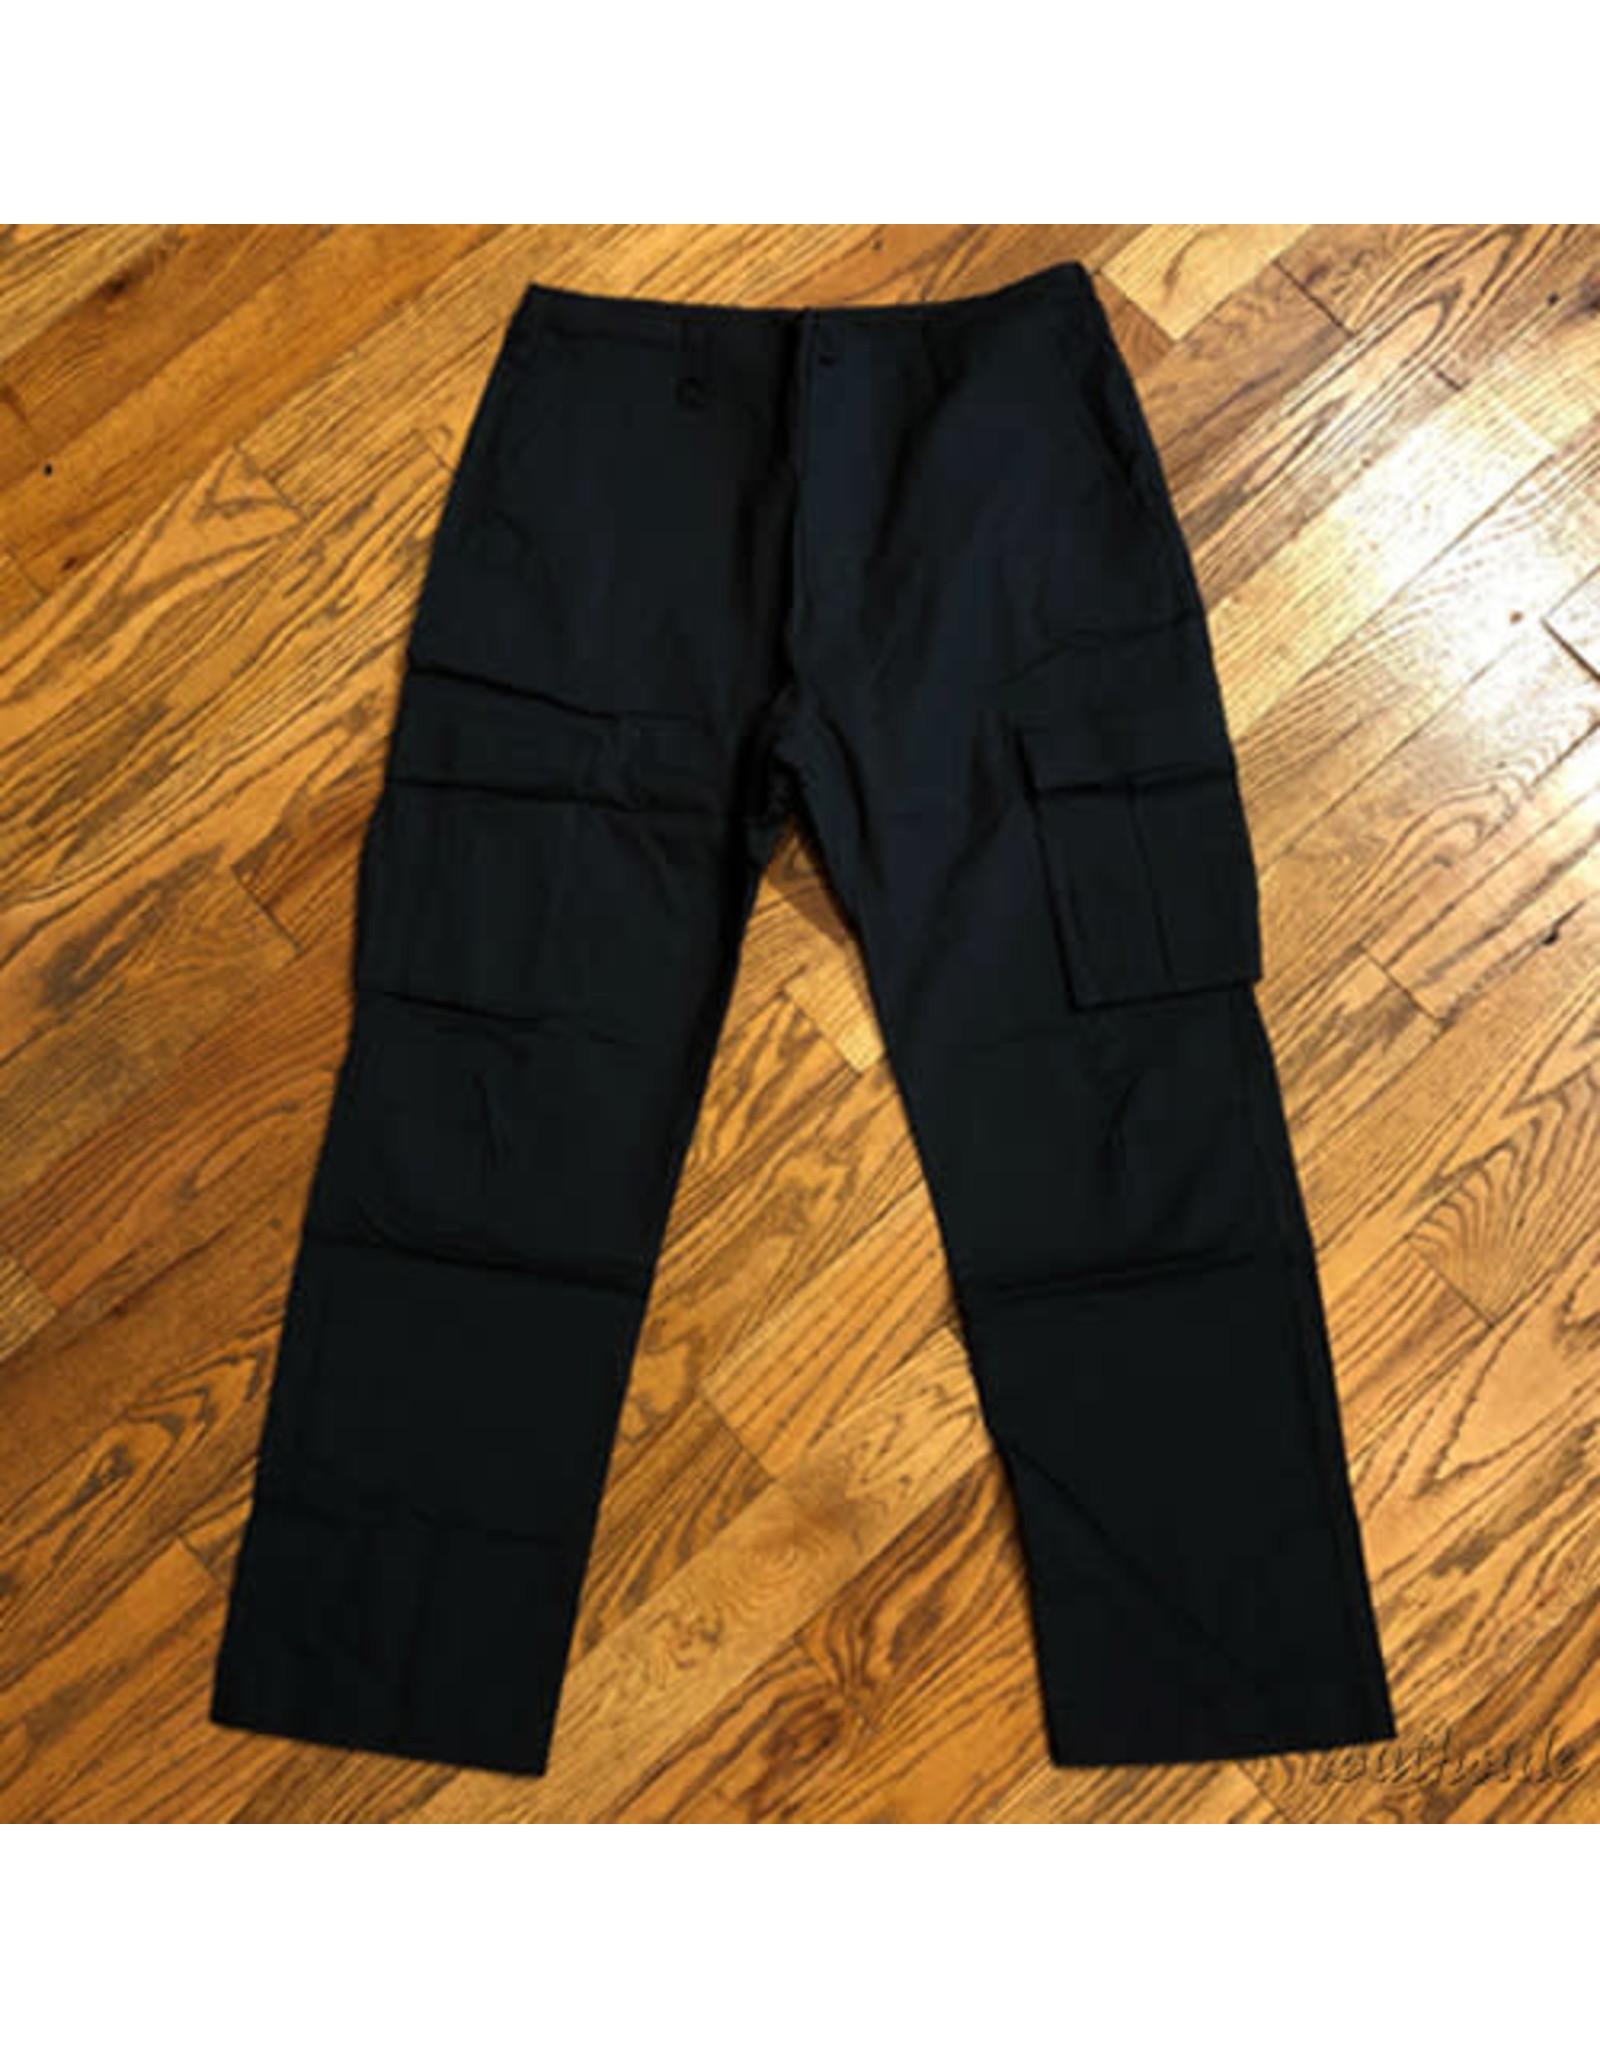 Nike Nike SB Cargo Pant Black